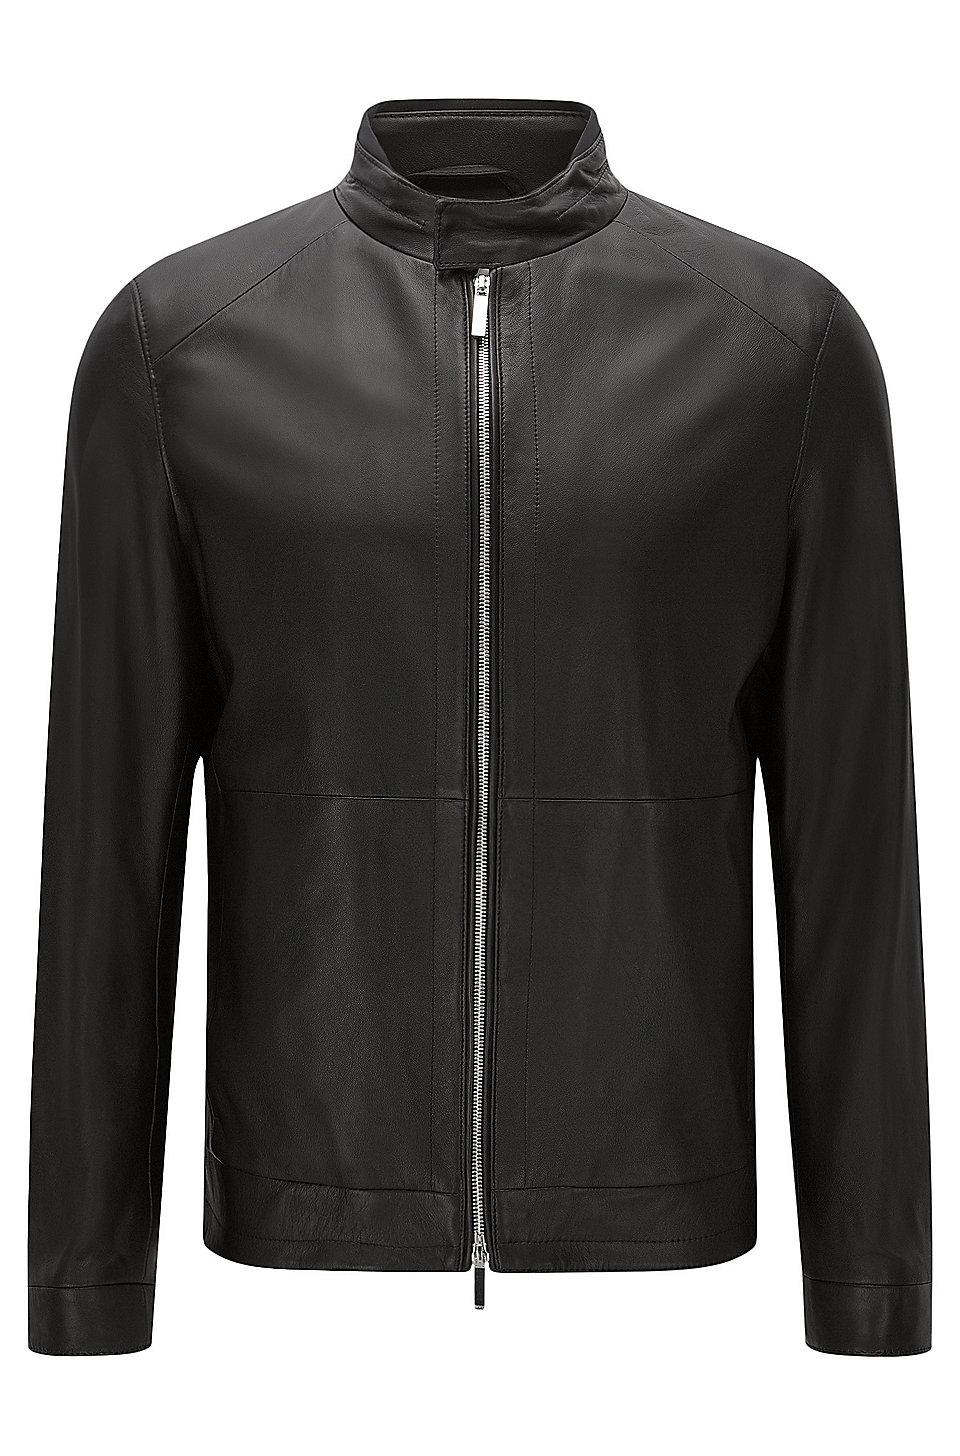 Hugo boss ladies leather gloves -  Nartimo Lambskin Biker Jacket